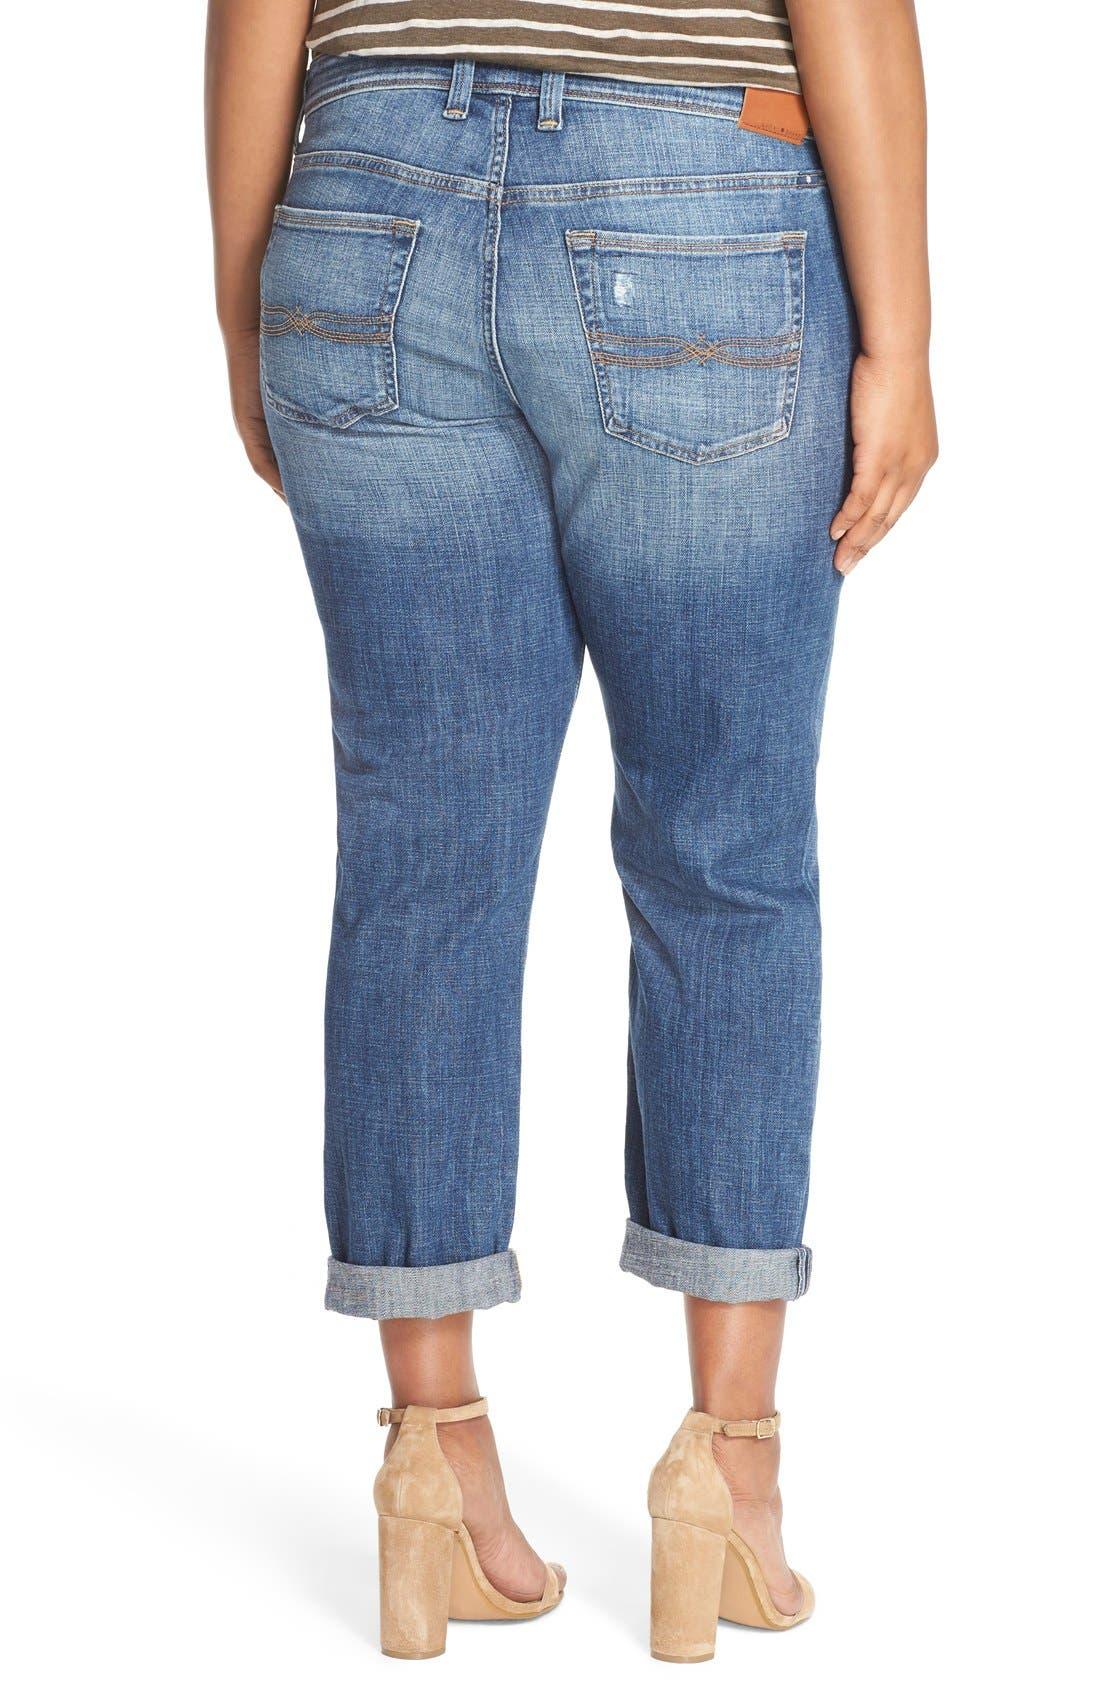 Alternate Image 3  - Lucky Brand Reese Distressed Boyfriend Jeans (Northridge Park) (Plus Size)